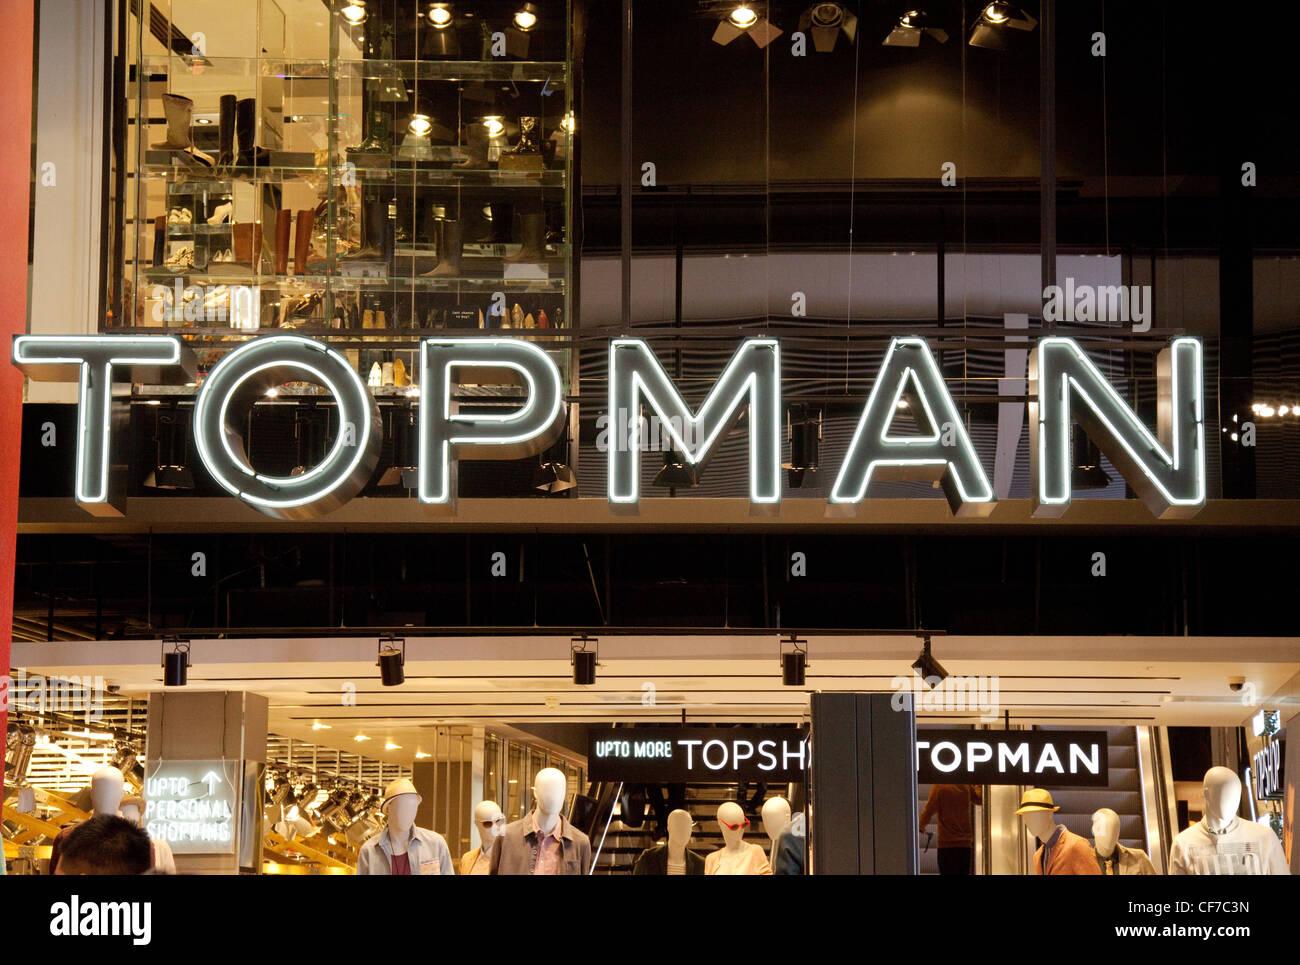 Topman store sign, UK - Stock Image